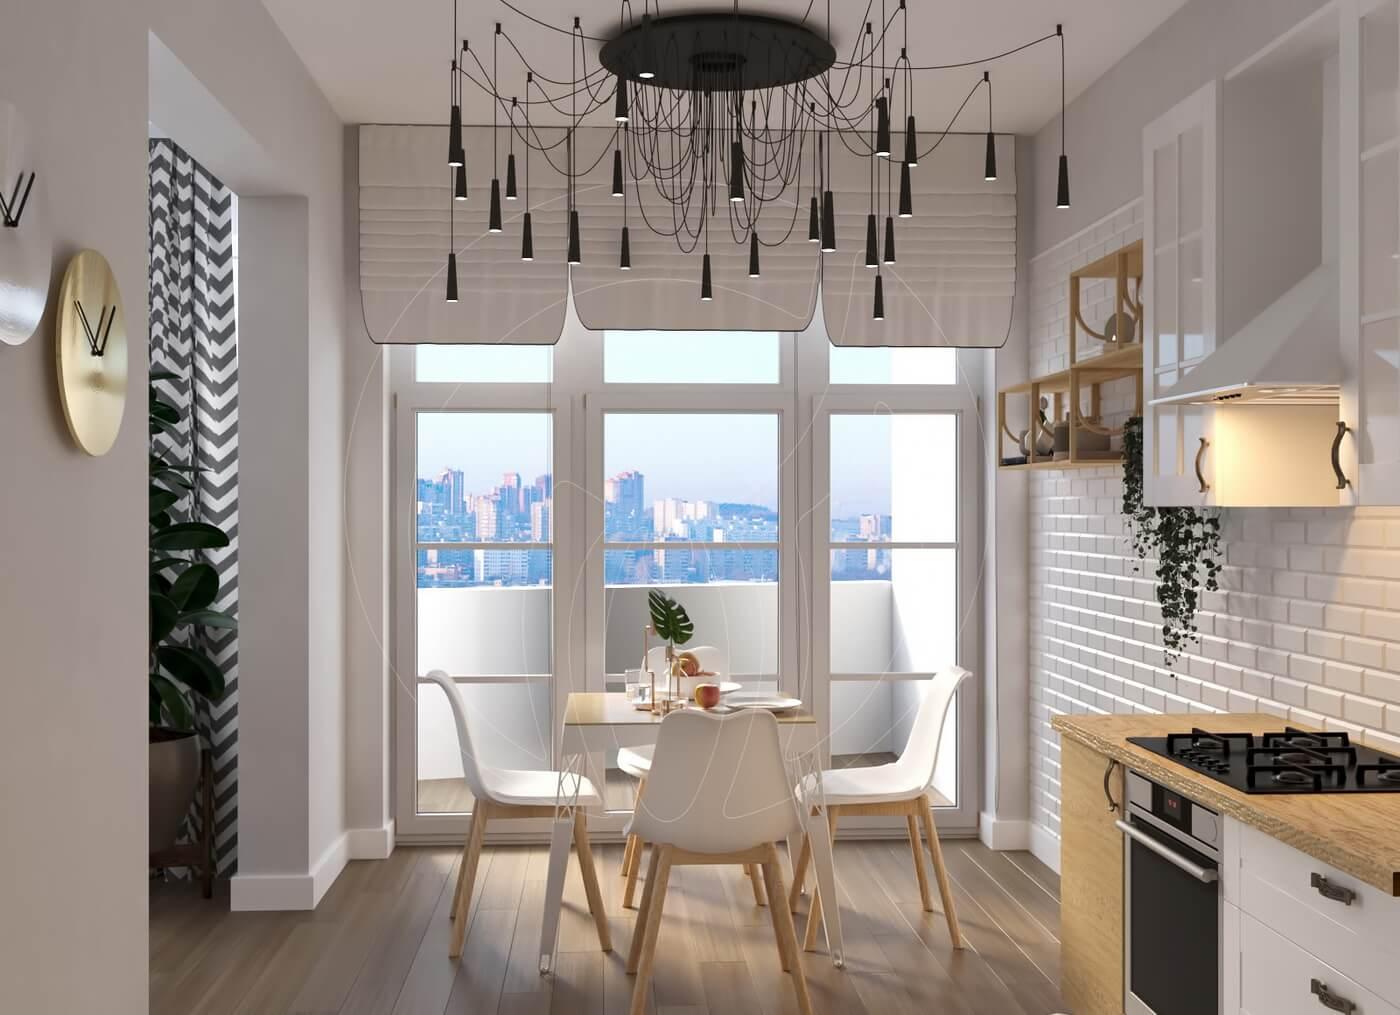 Квартира в скандинавском стиле и стиле LOFT. Кухня, обеденный стол